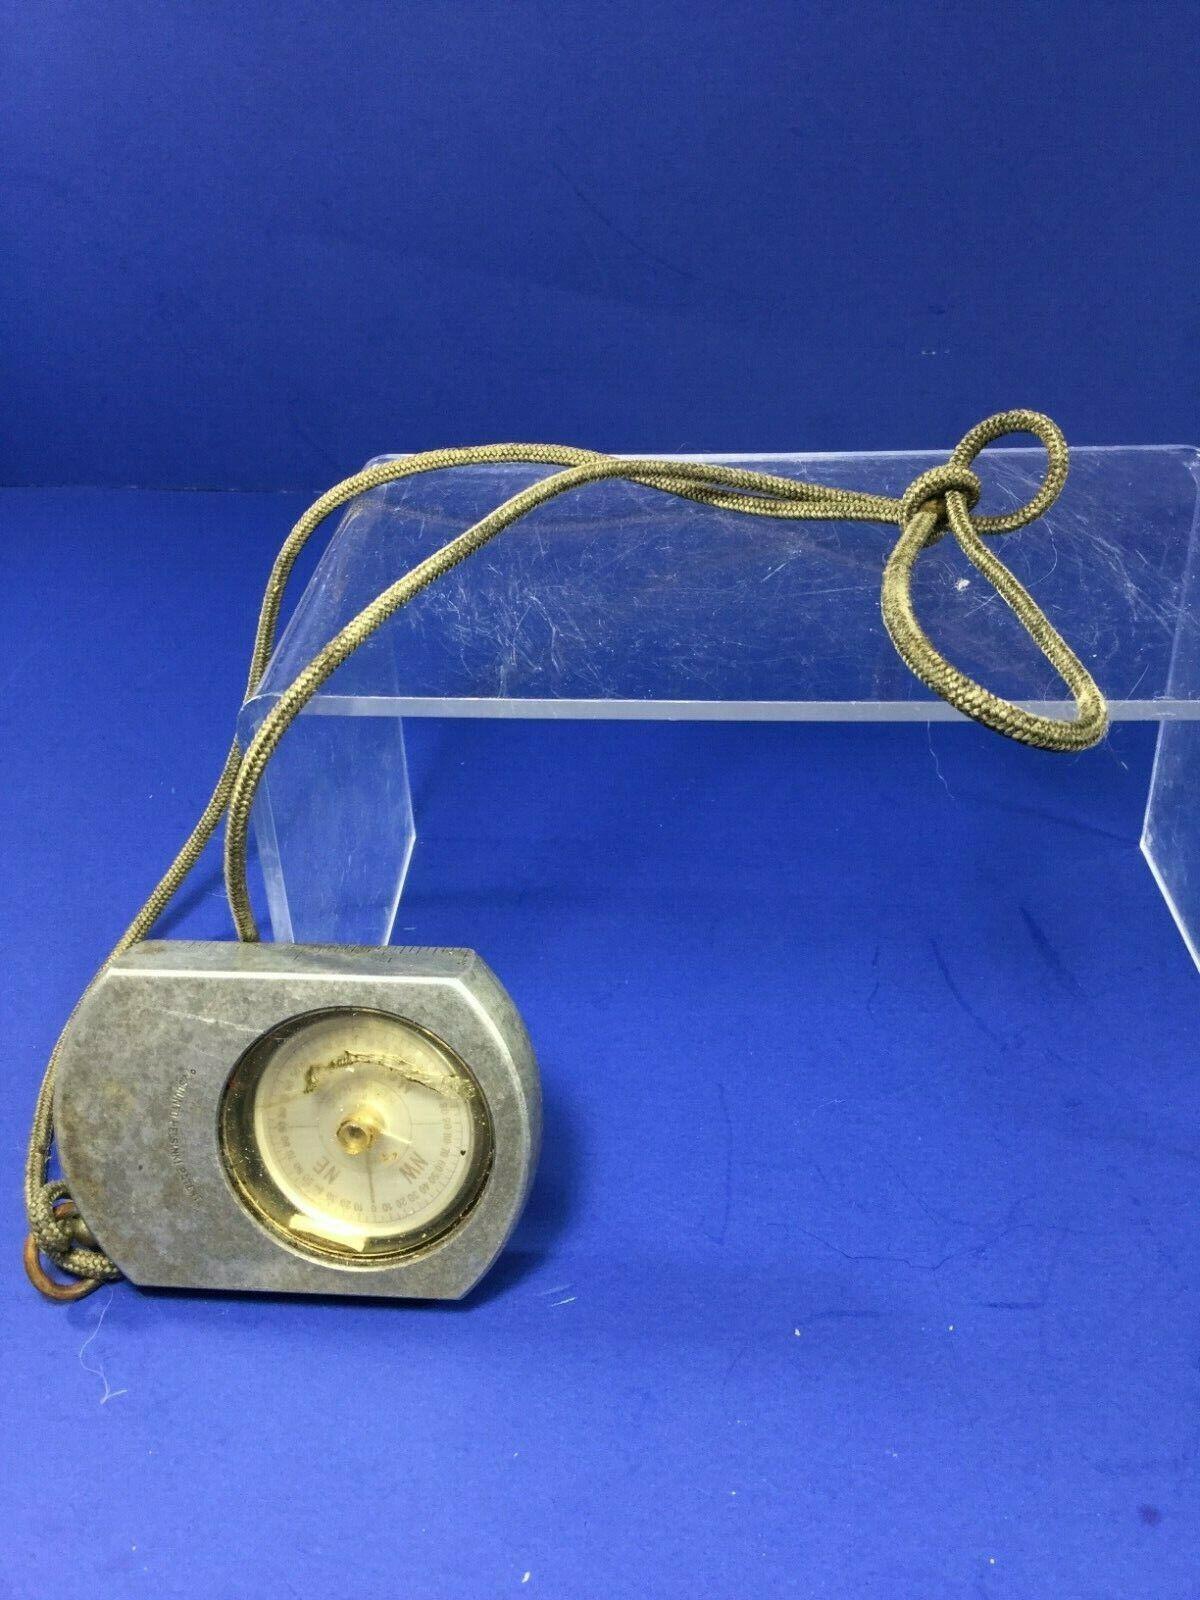 Vintage, Suunto Co. KB-14 360Q Global  Optical Sighting Compass, Helsinki Patent  free shipping worldwide